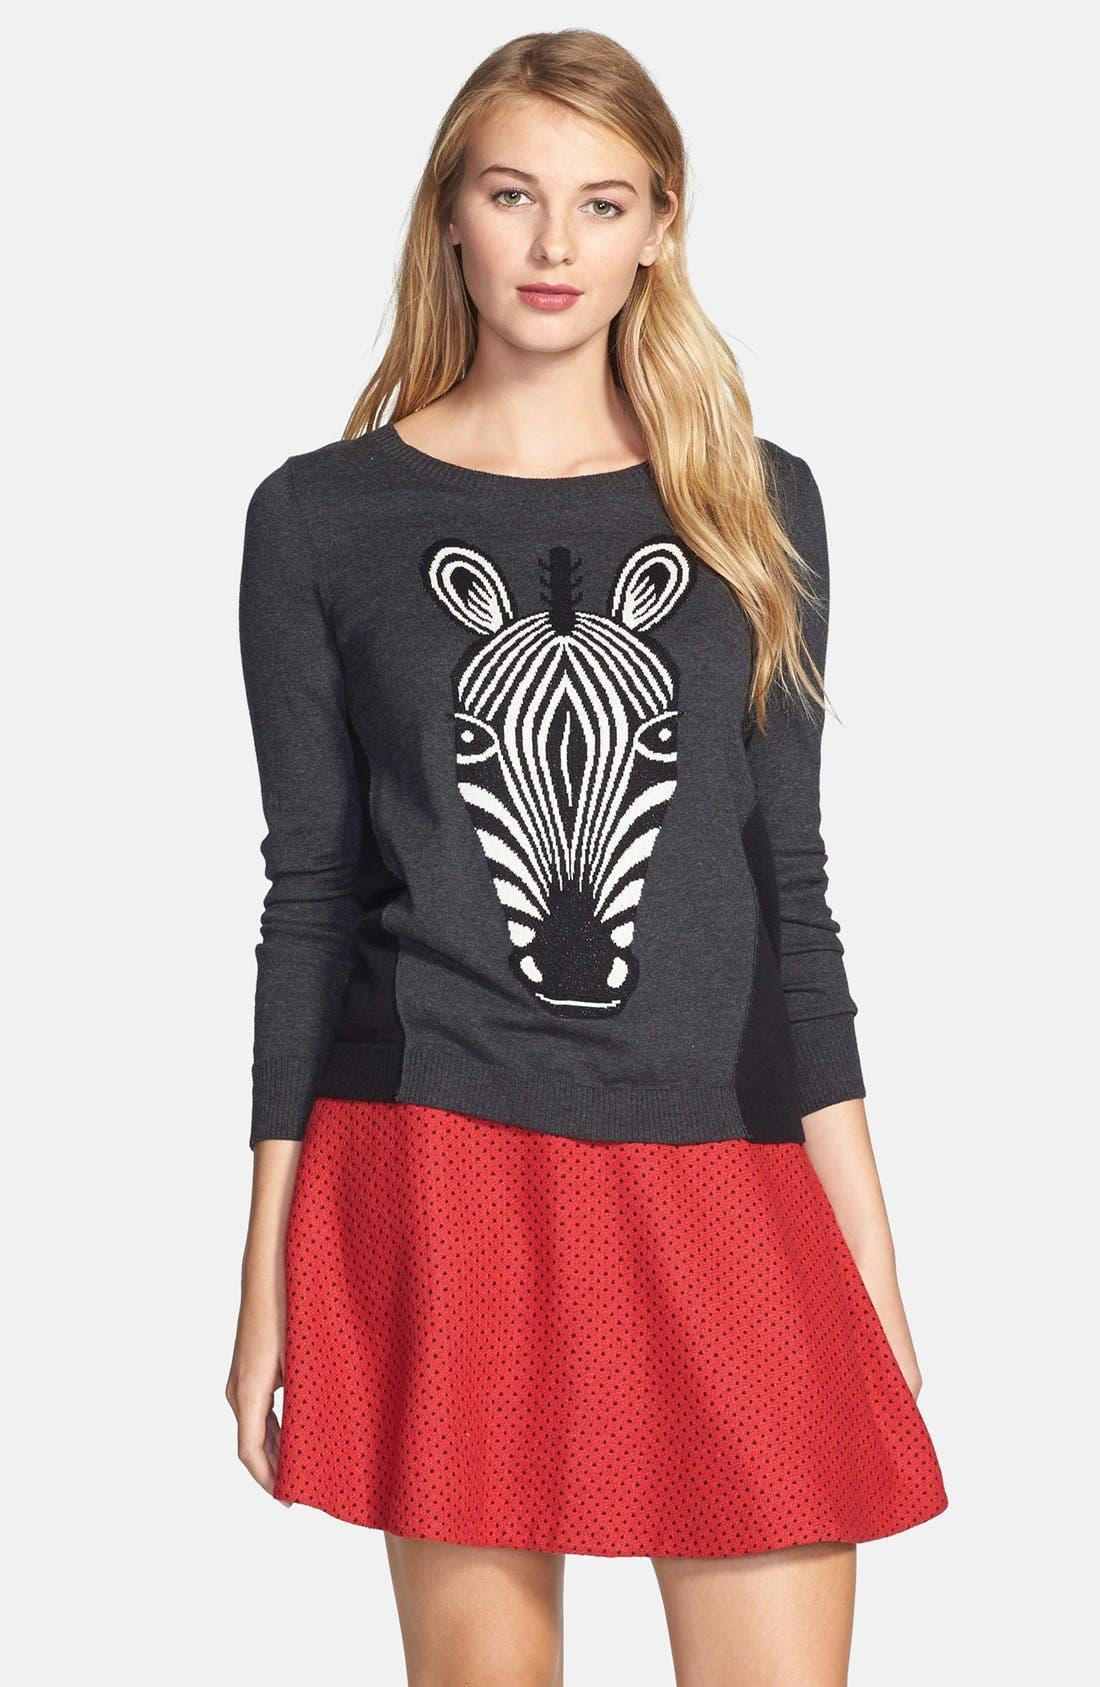 Alternate Image 1 Selected - kensie Zebra Intarsia Sweater